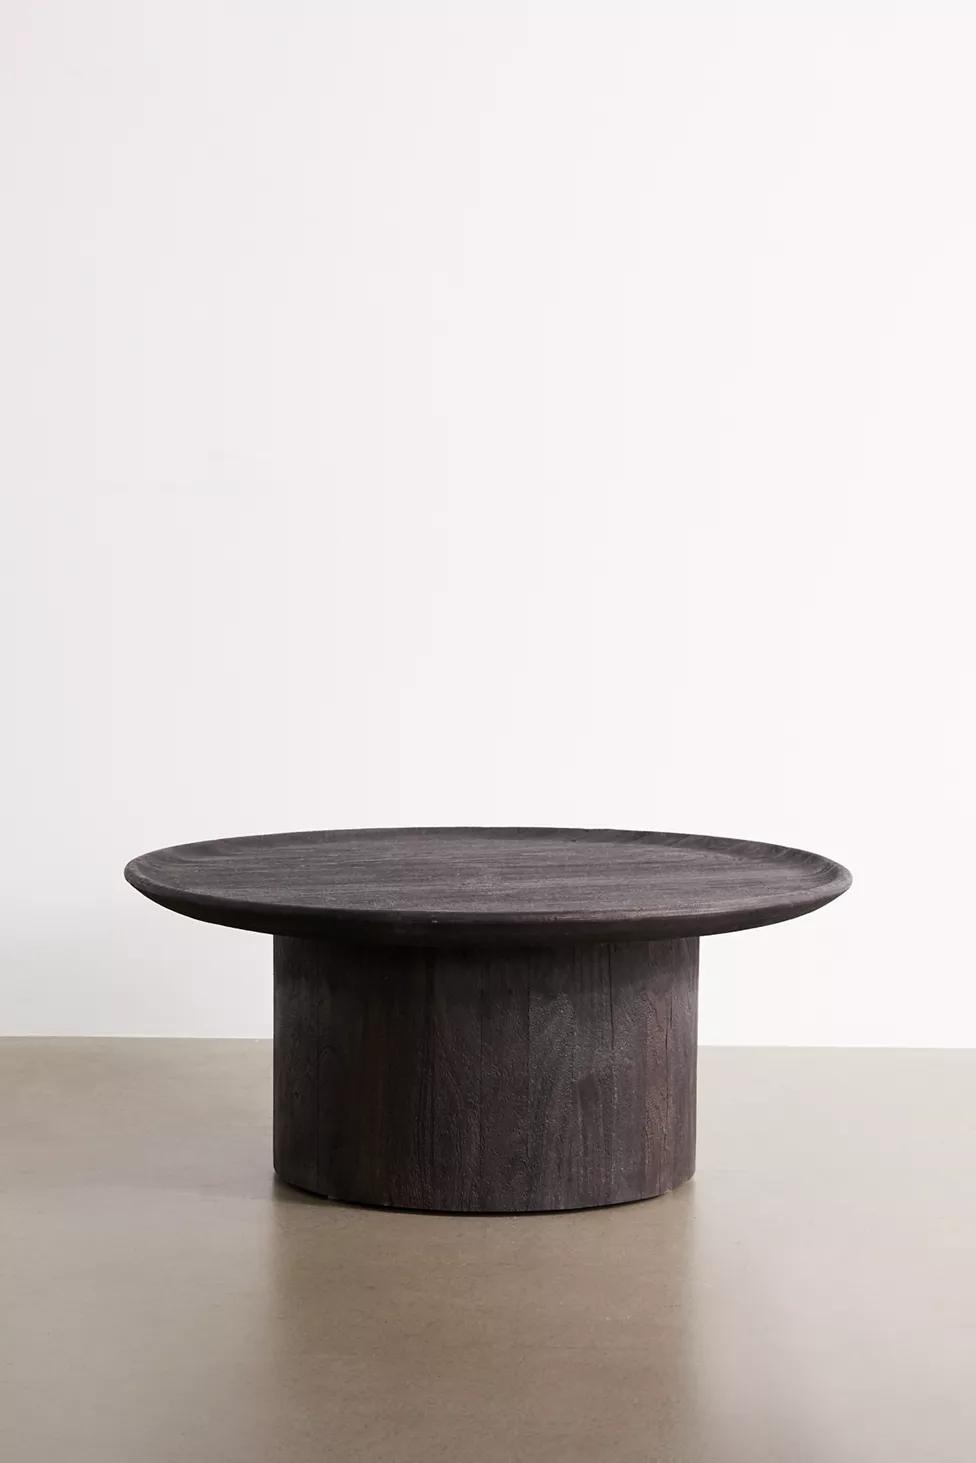 Matro Coffee Table Coffee Table Urban Outfitters Coffee Table Coffee Table Wood [ 1463 x 976 Pixel ]